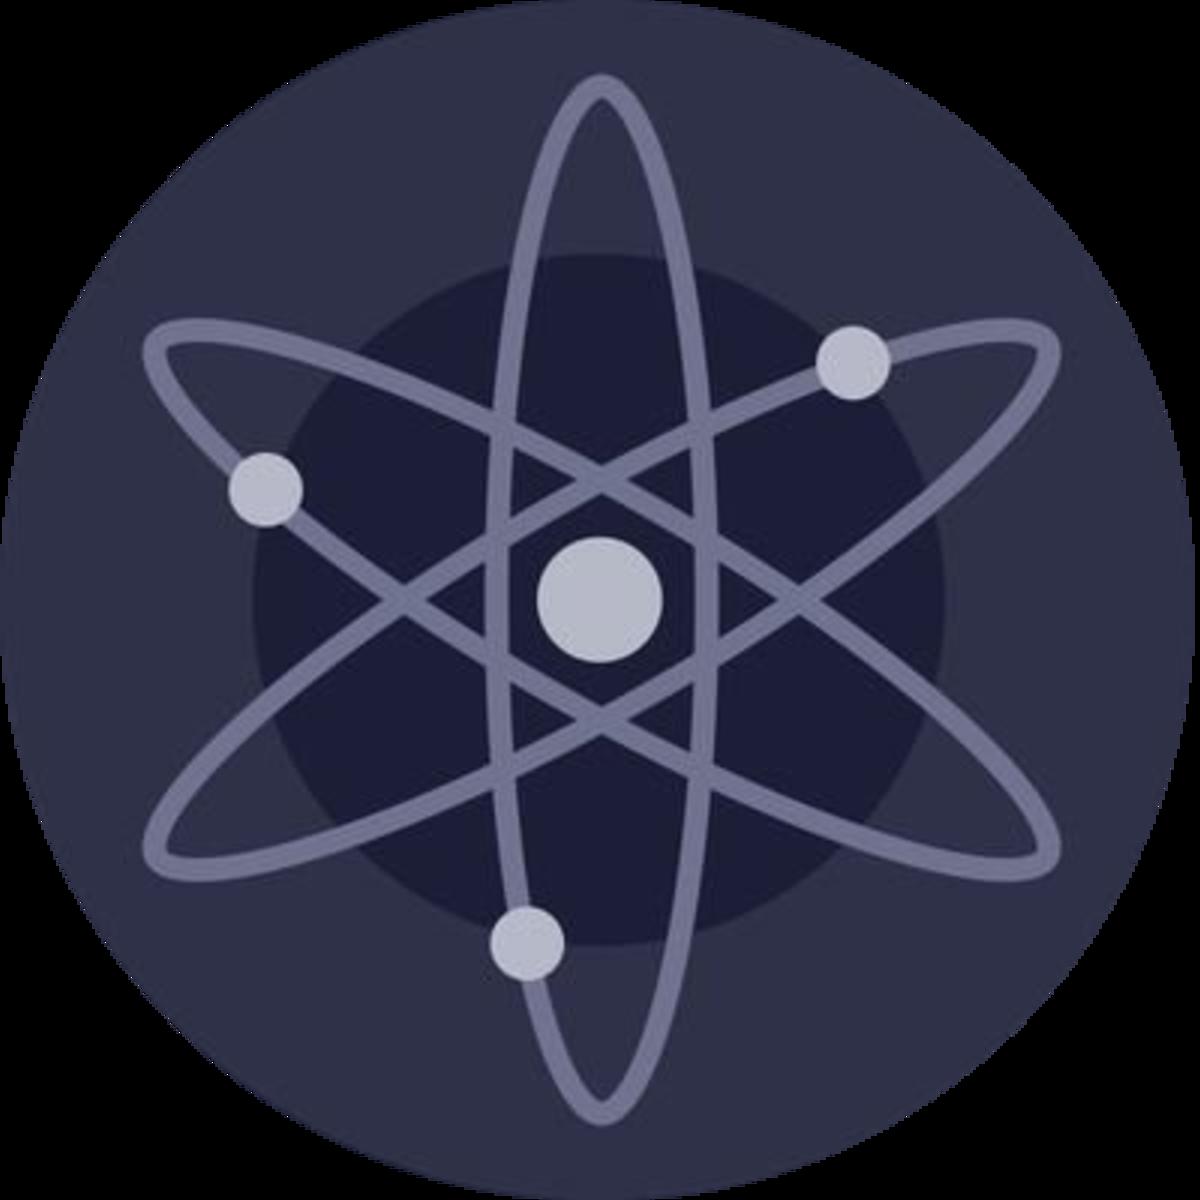 The Cosmos and ATOM logo